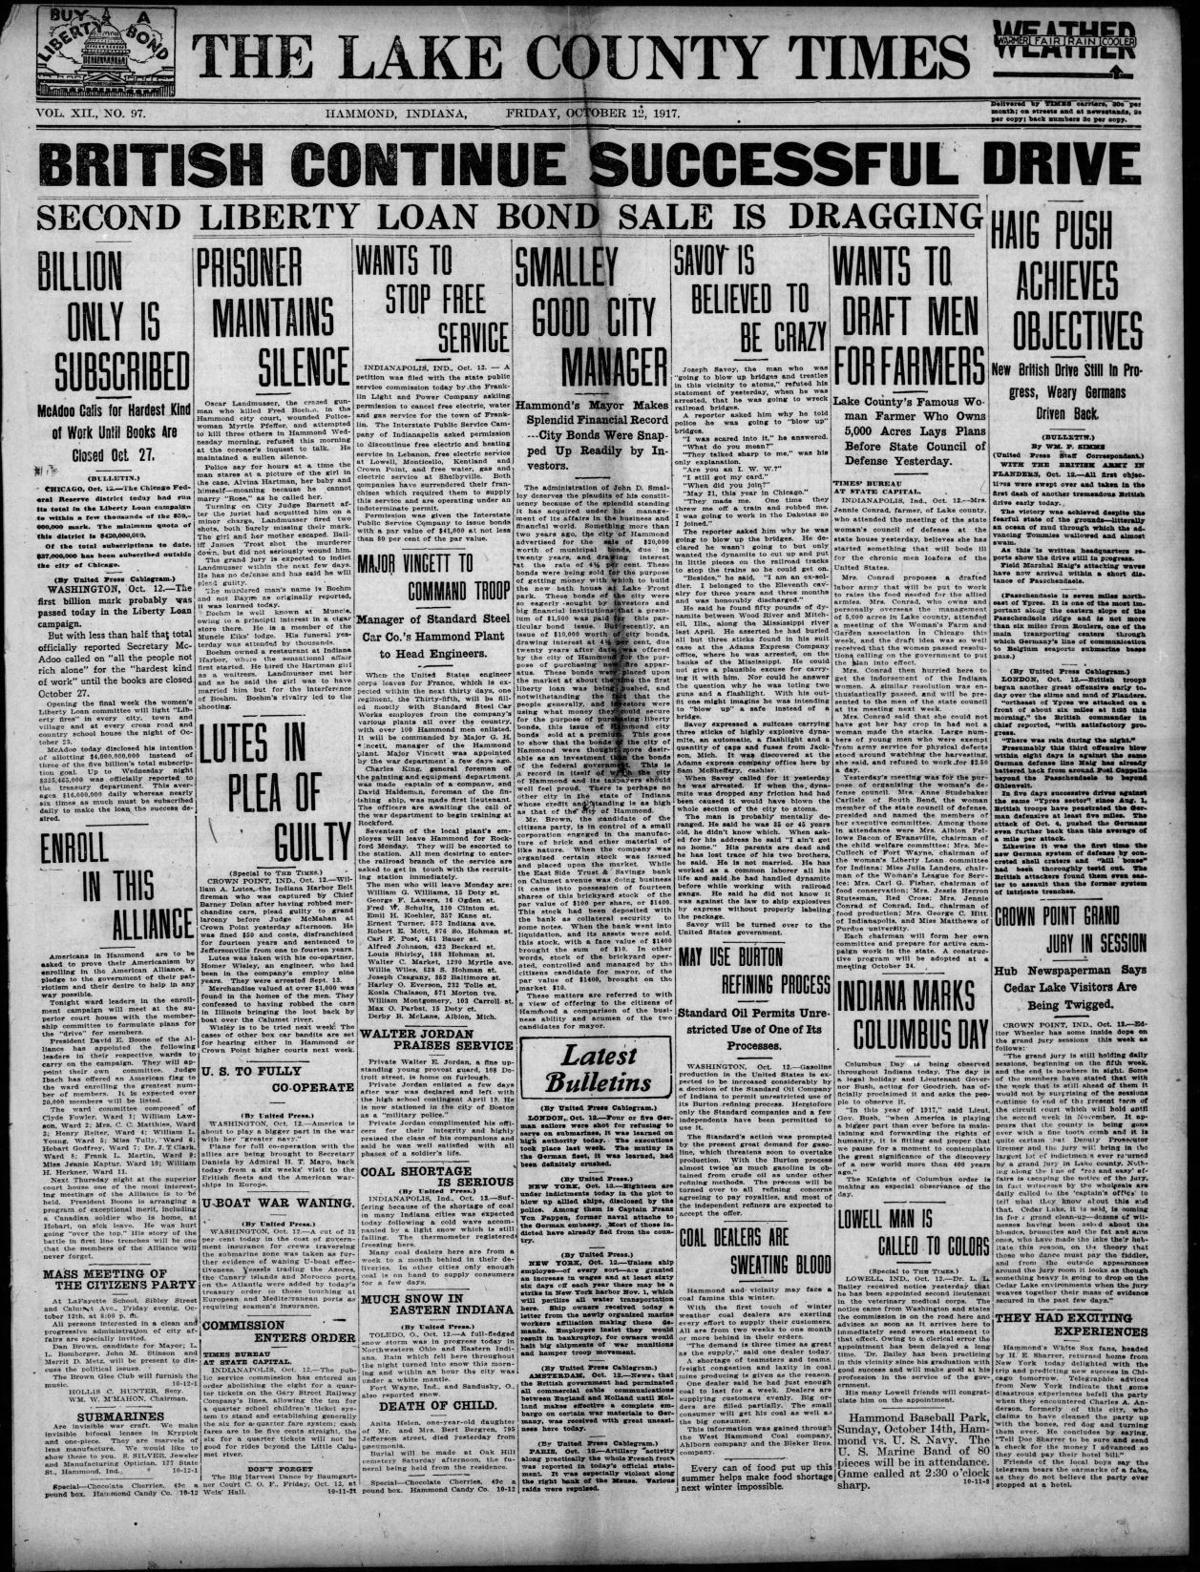 Oct. 12, 1917: May Use Burton Refining Process